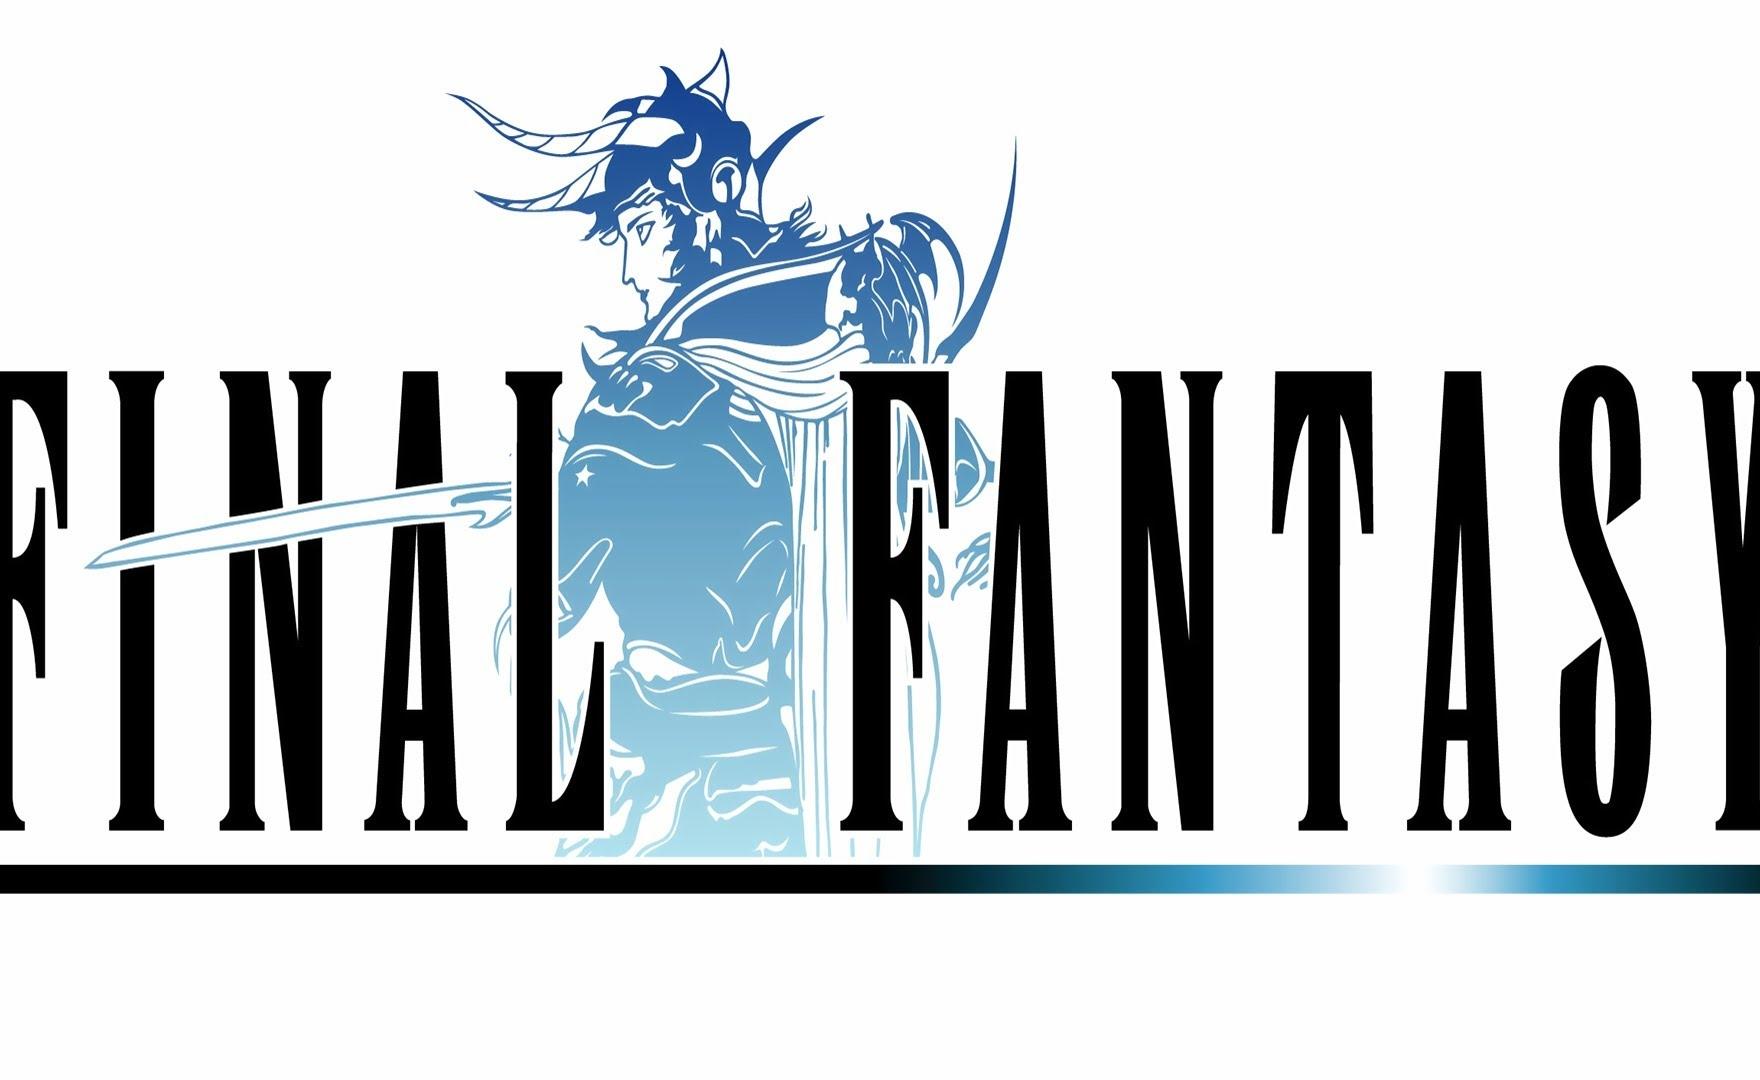 Final Fantasy, in arrivo uno spin-off soulslike?